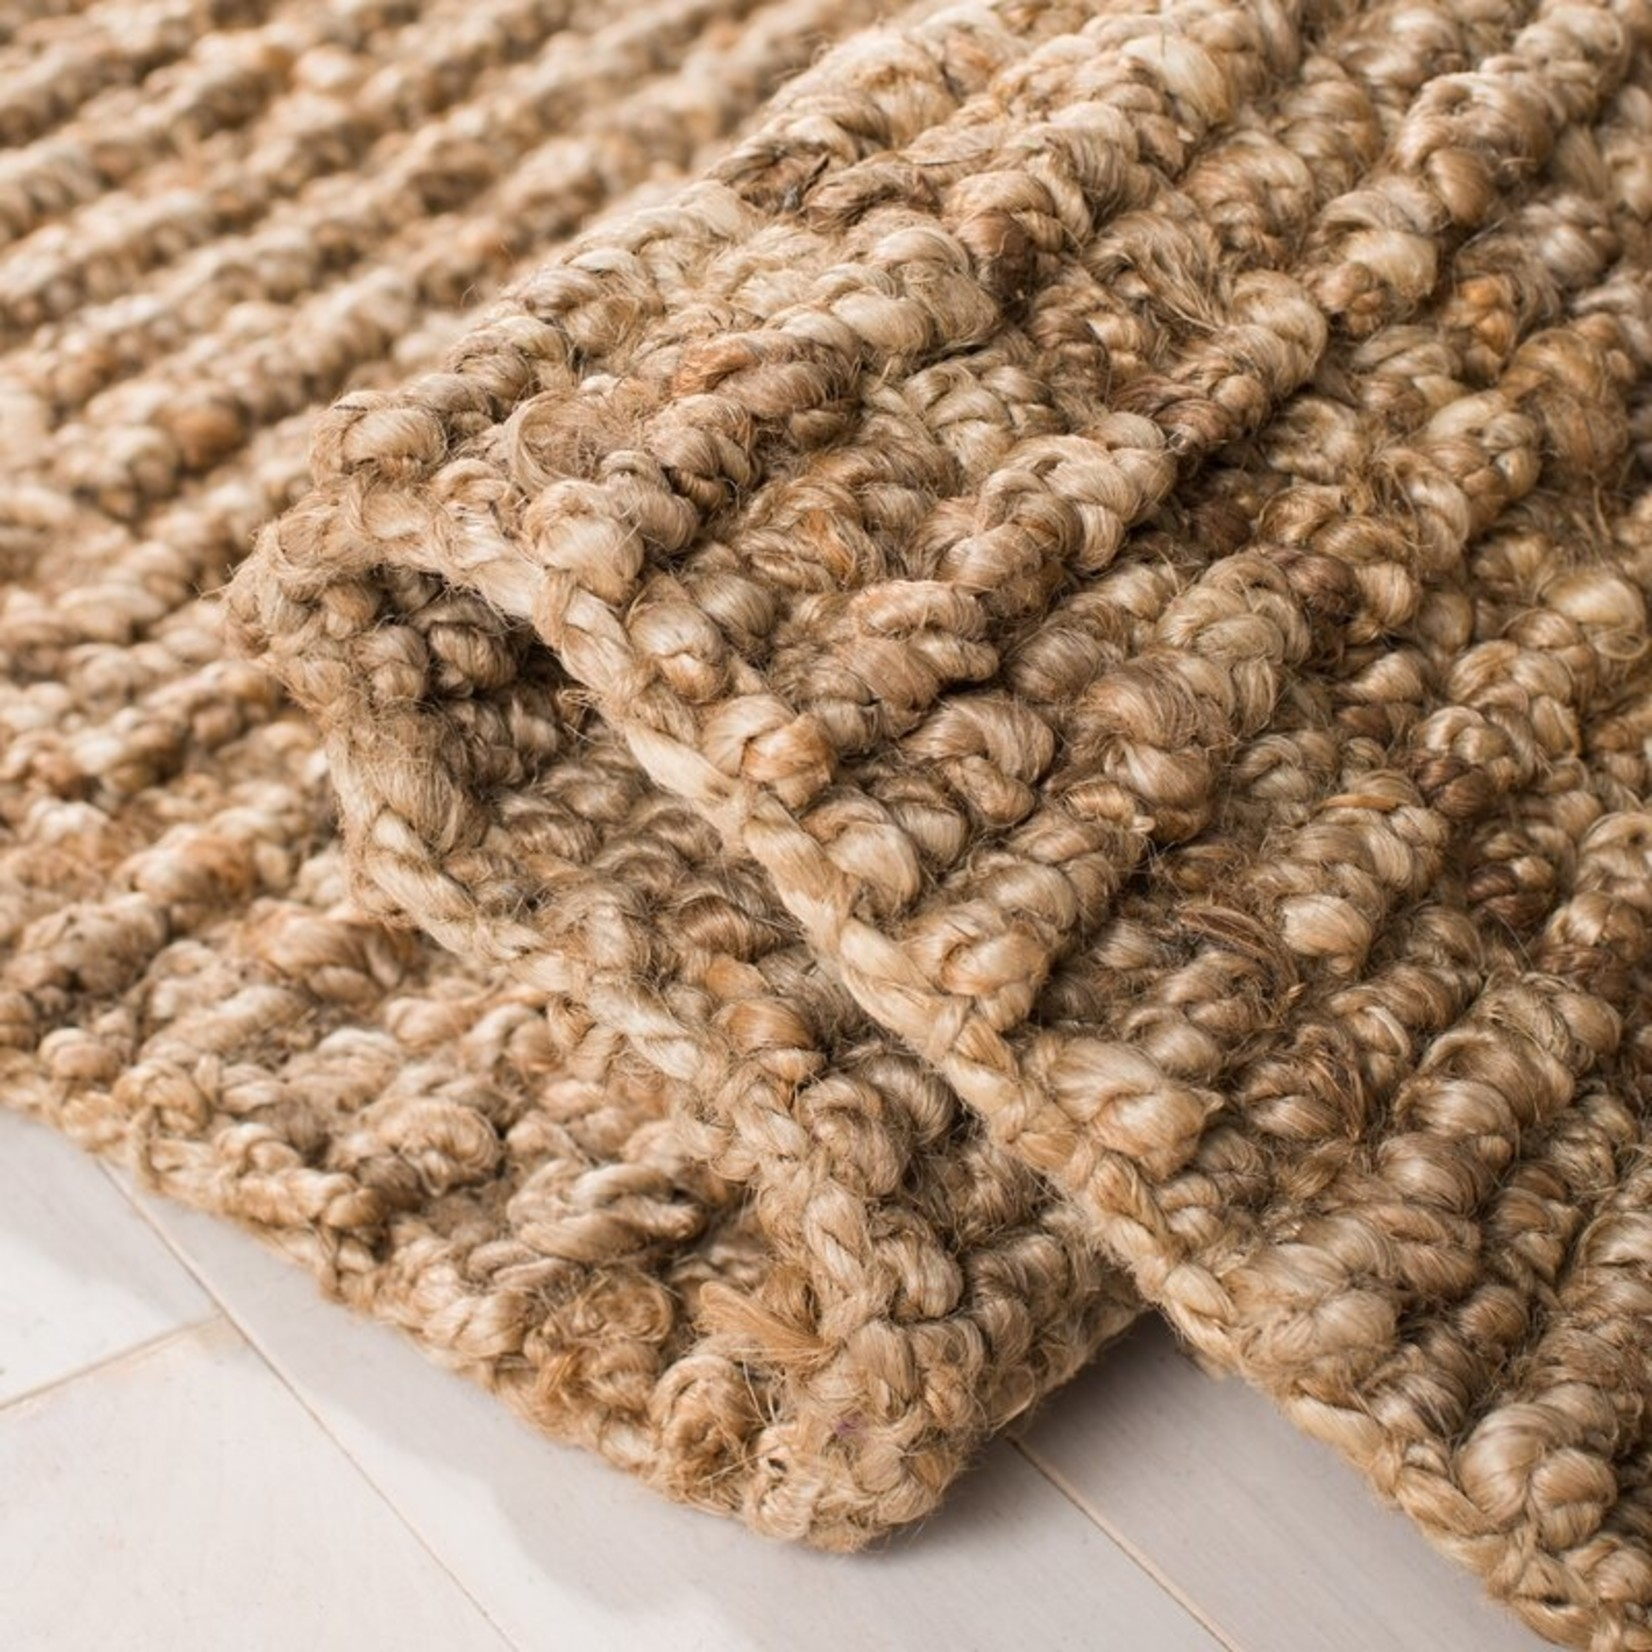 *2' x 3 - Grassmere Handmade Jute Natural Area Rug